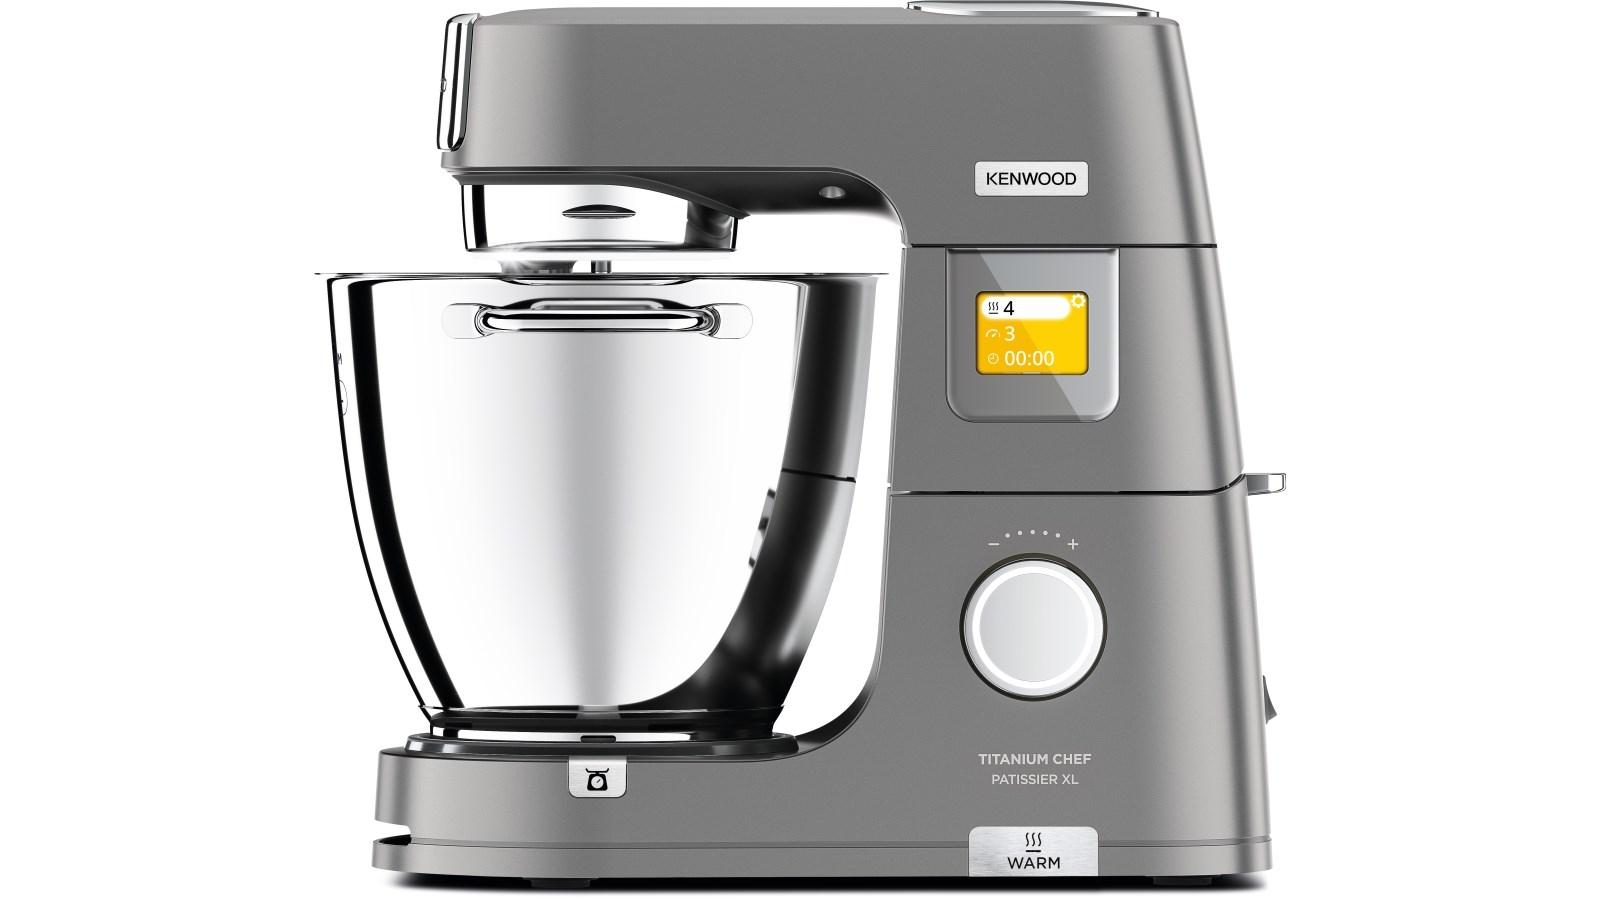 Image of Kenwood Chef XL Titanium Patissier Stand Mixer